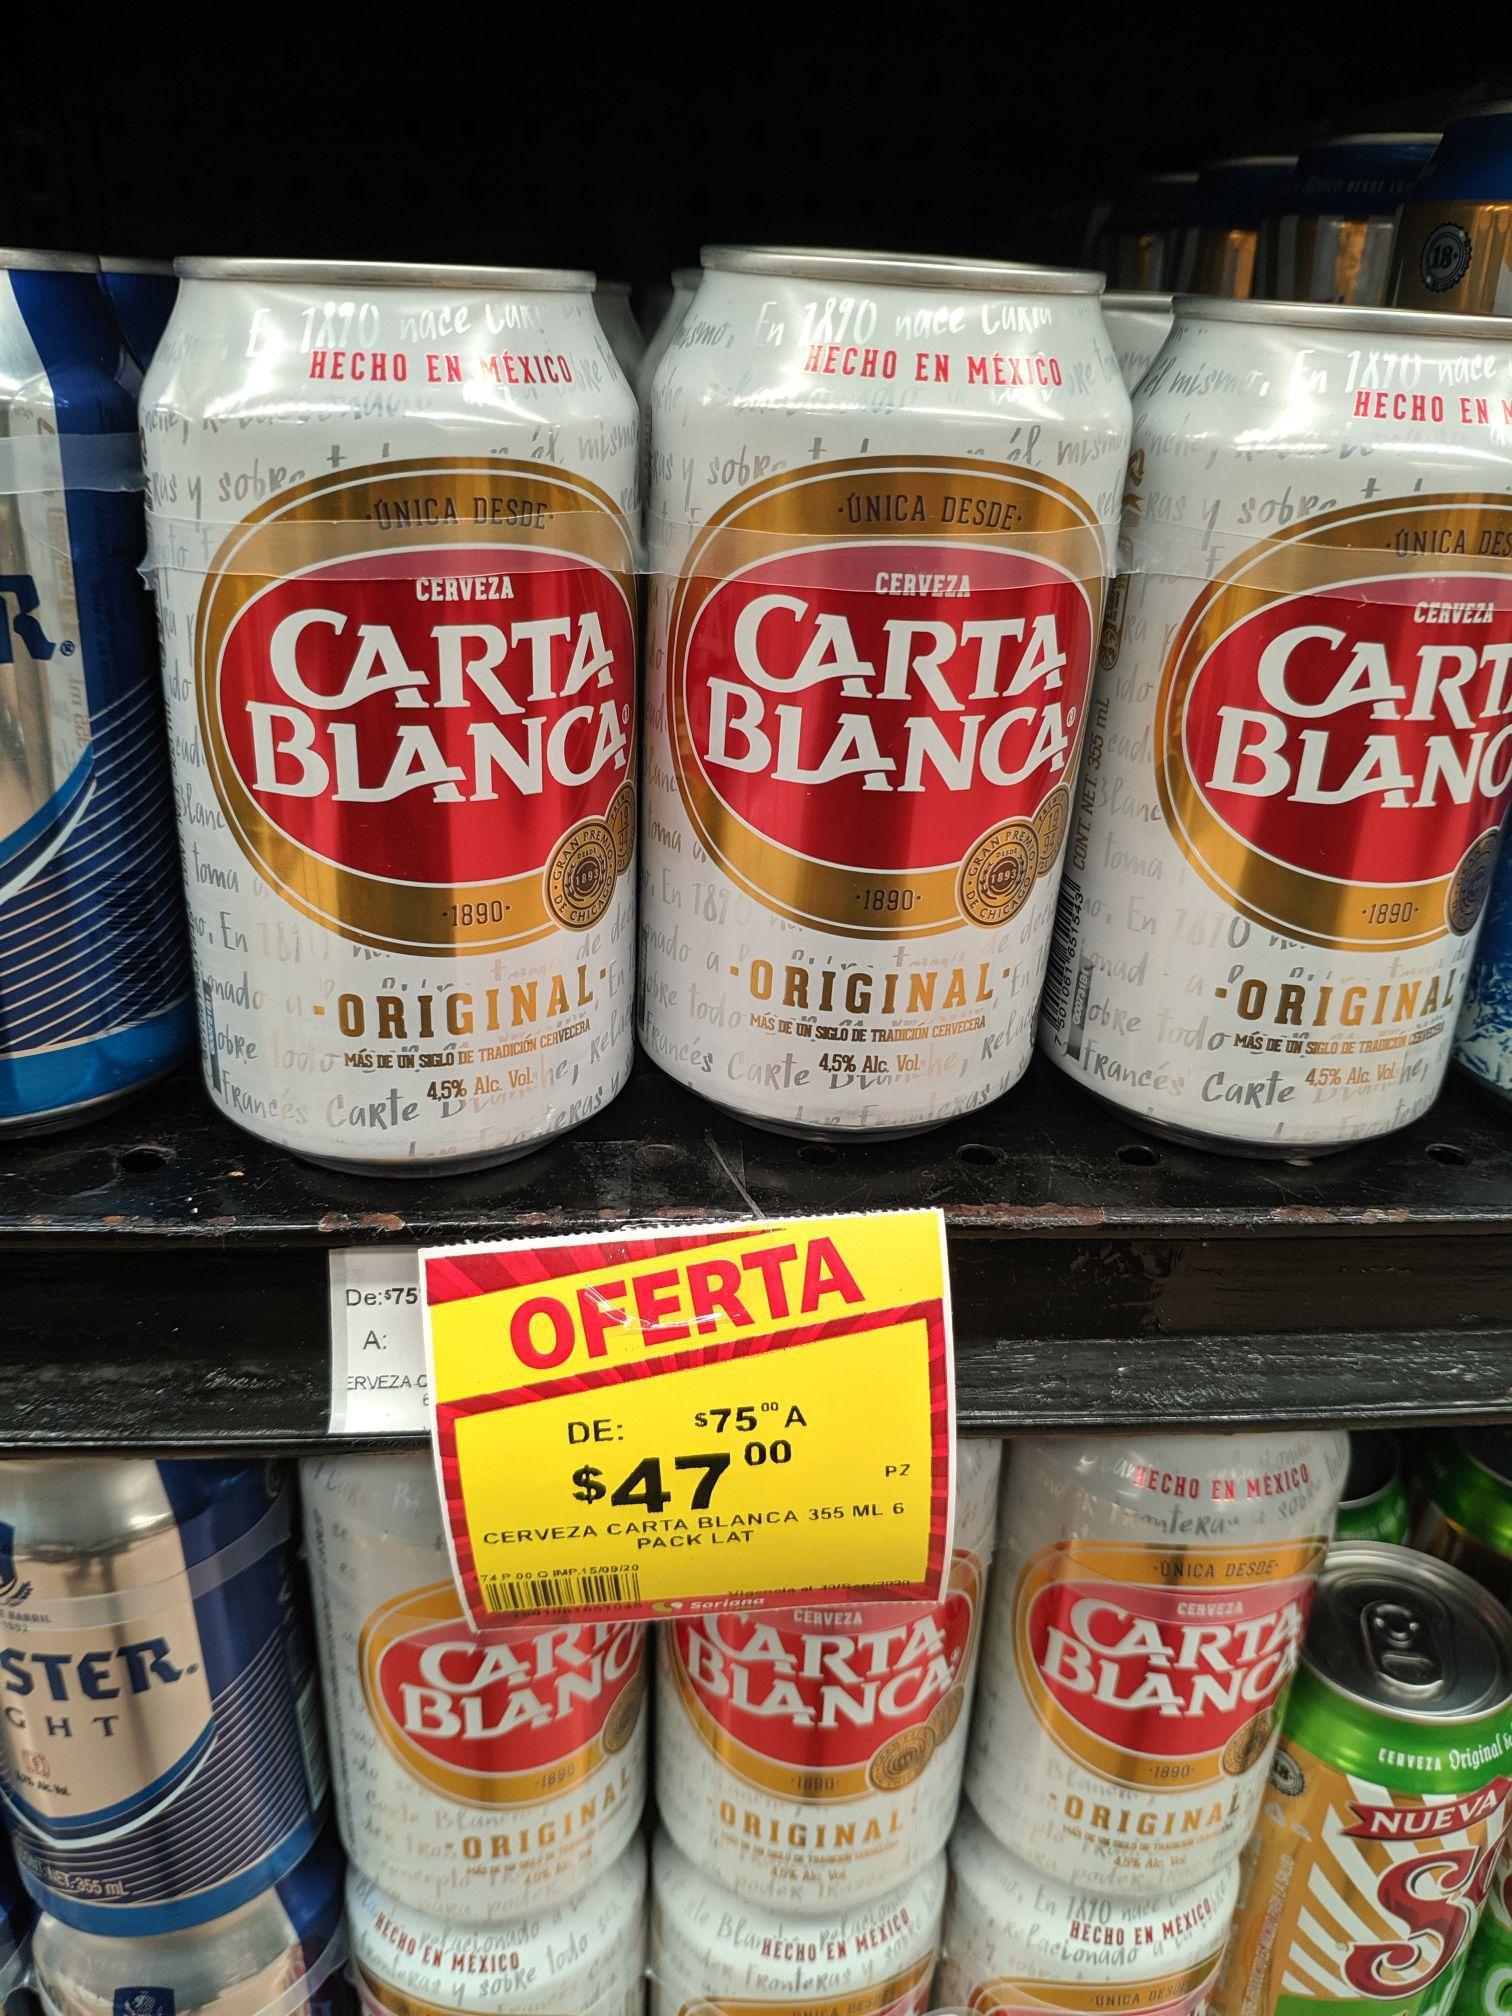 Soriana: Cerveza six carta blanca lata de 75 a 47